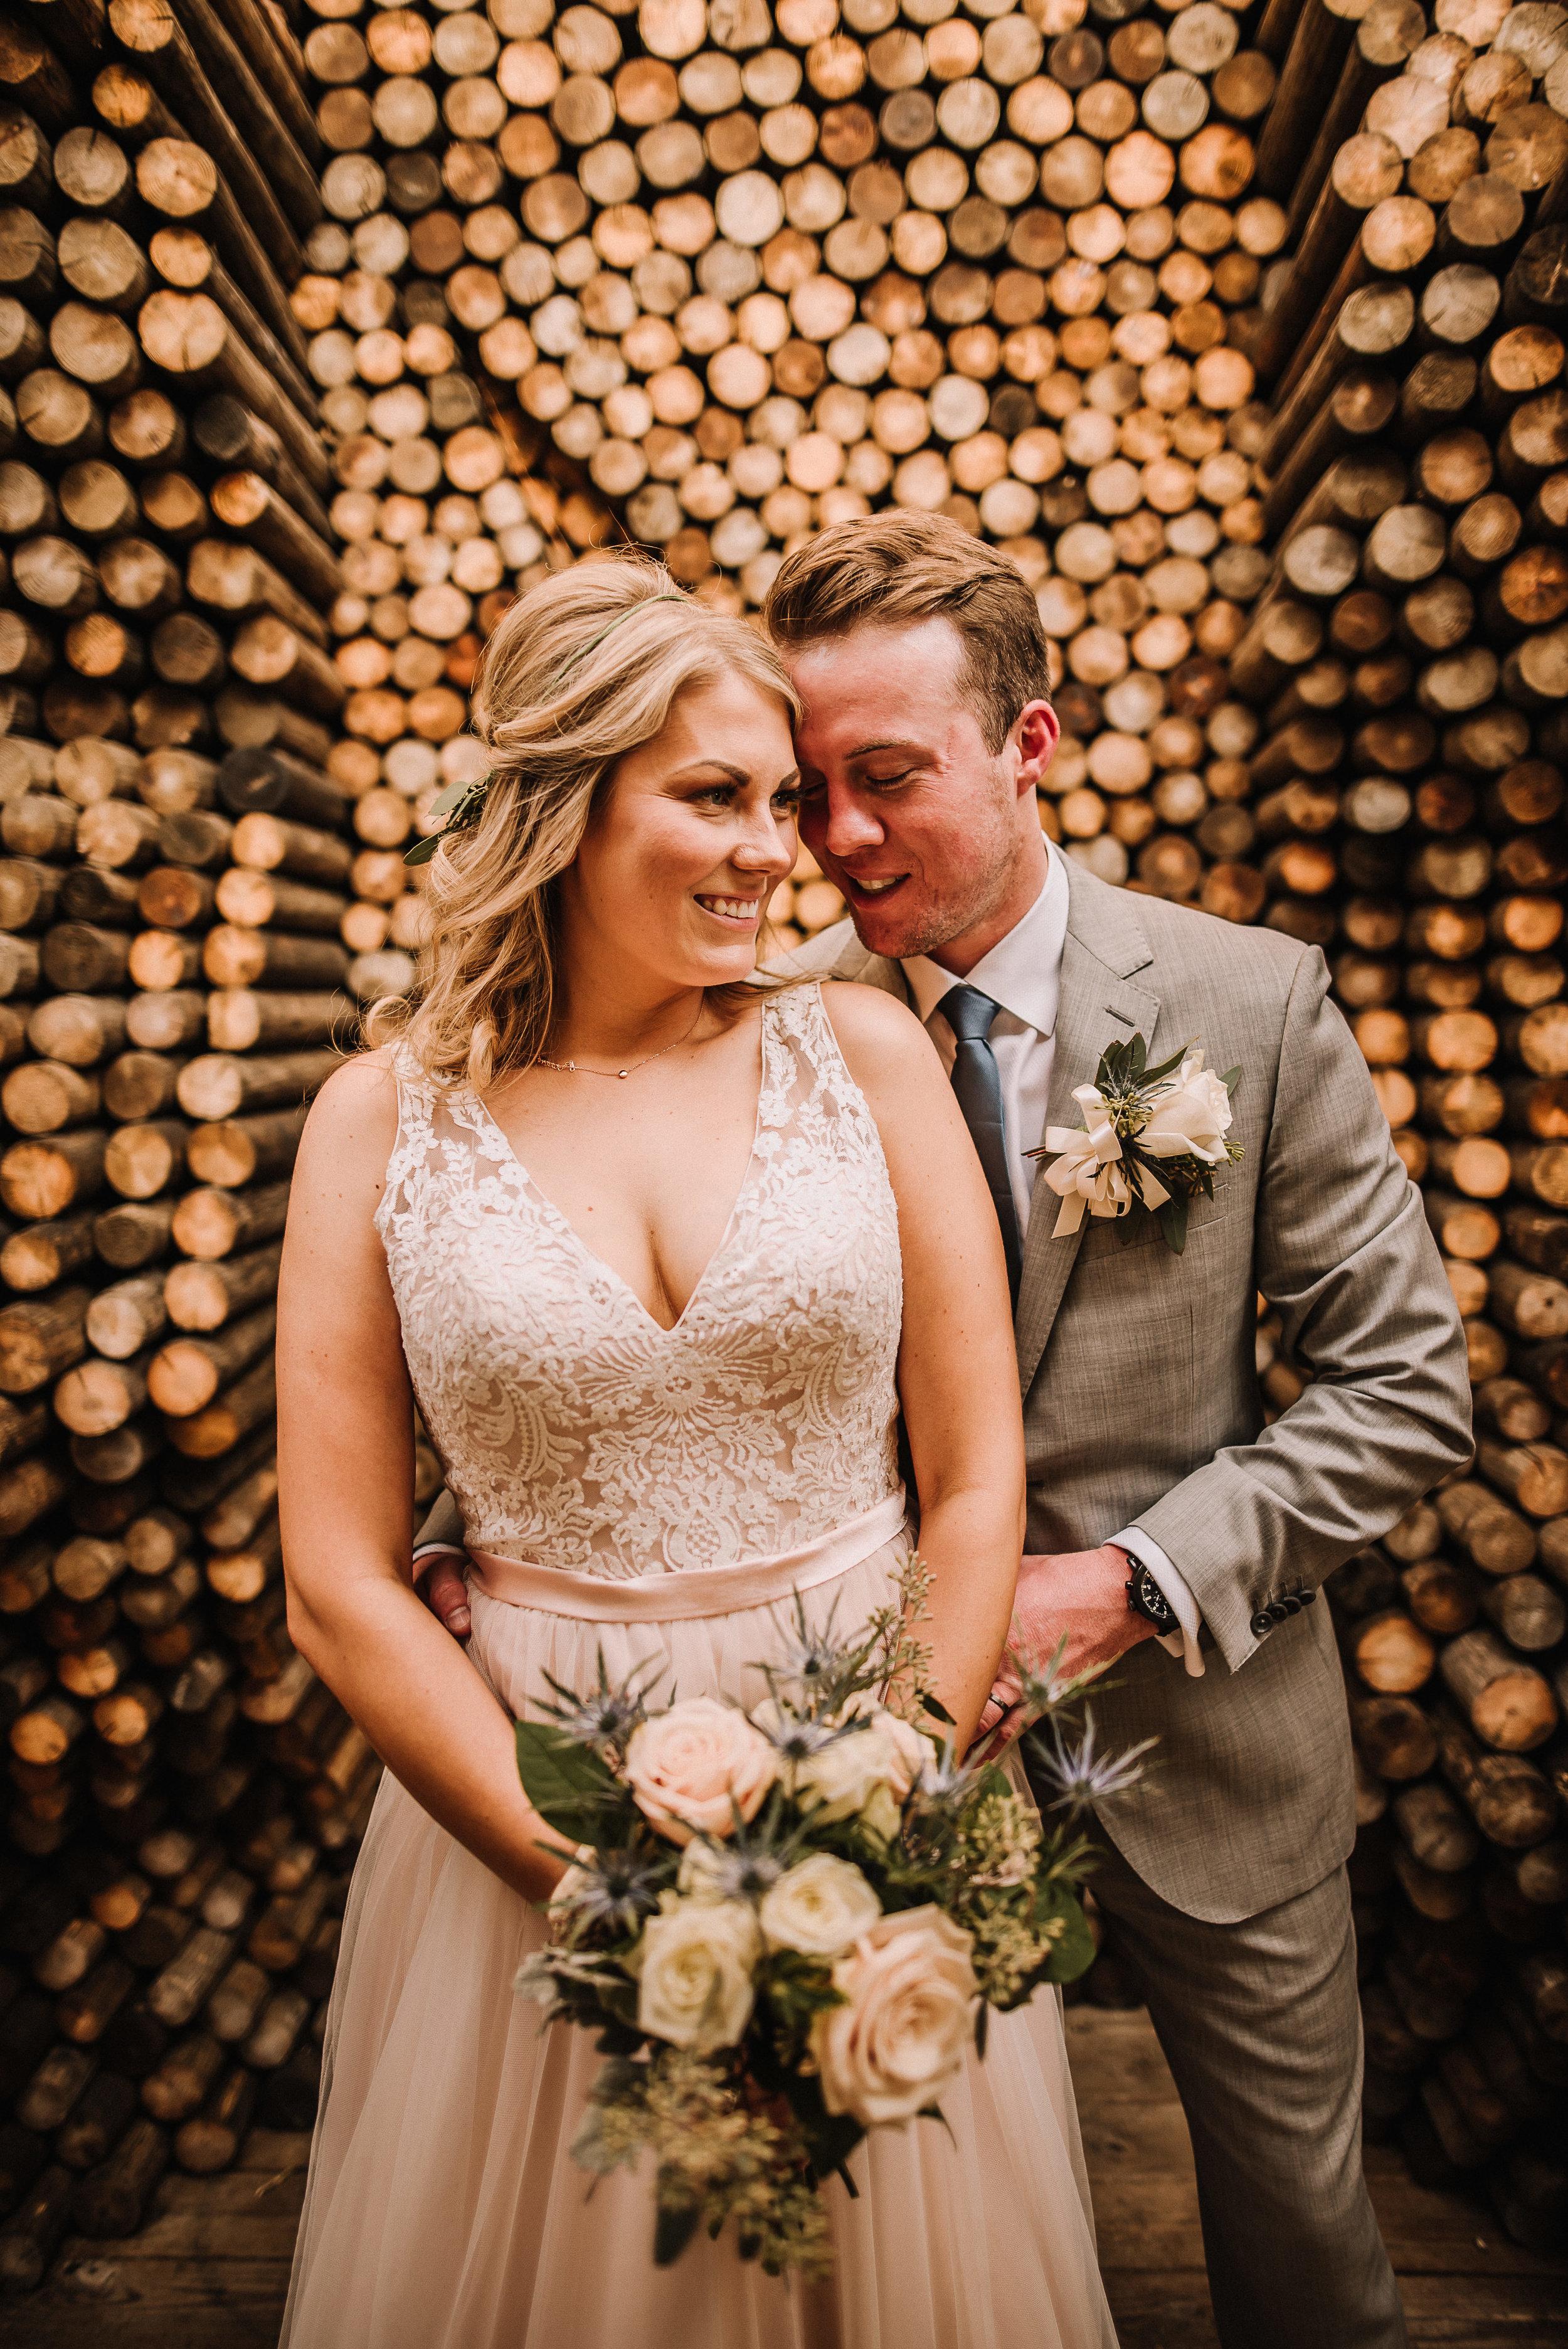 Pearson-Wiseacre-Wedding_Ashley-Benham-Photography (282 of 633).jpg